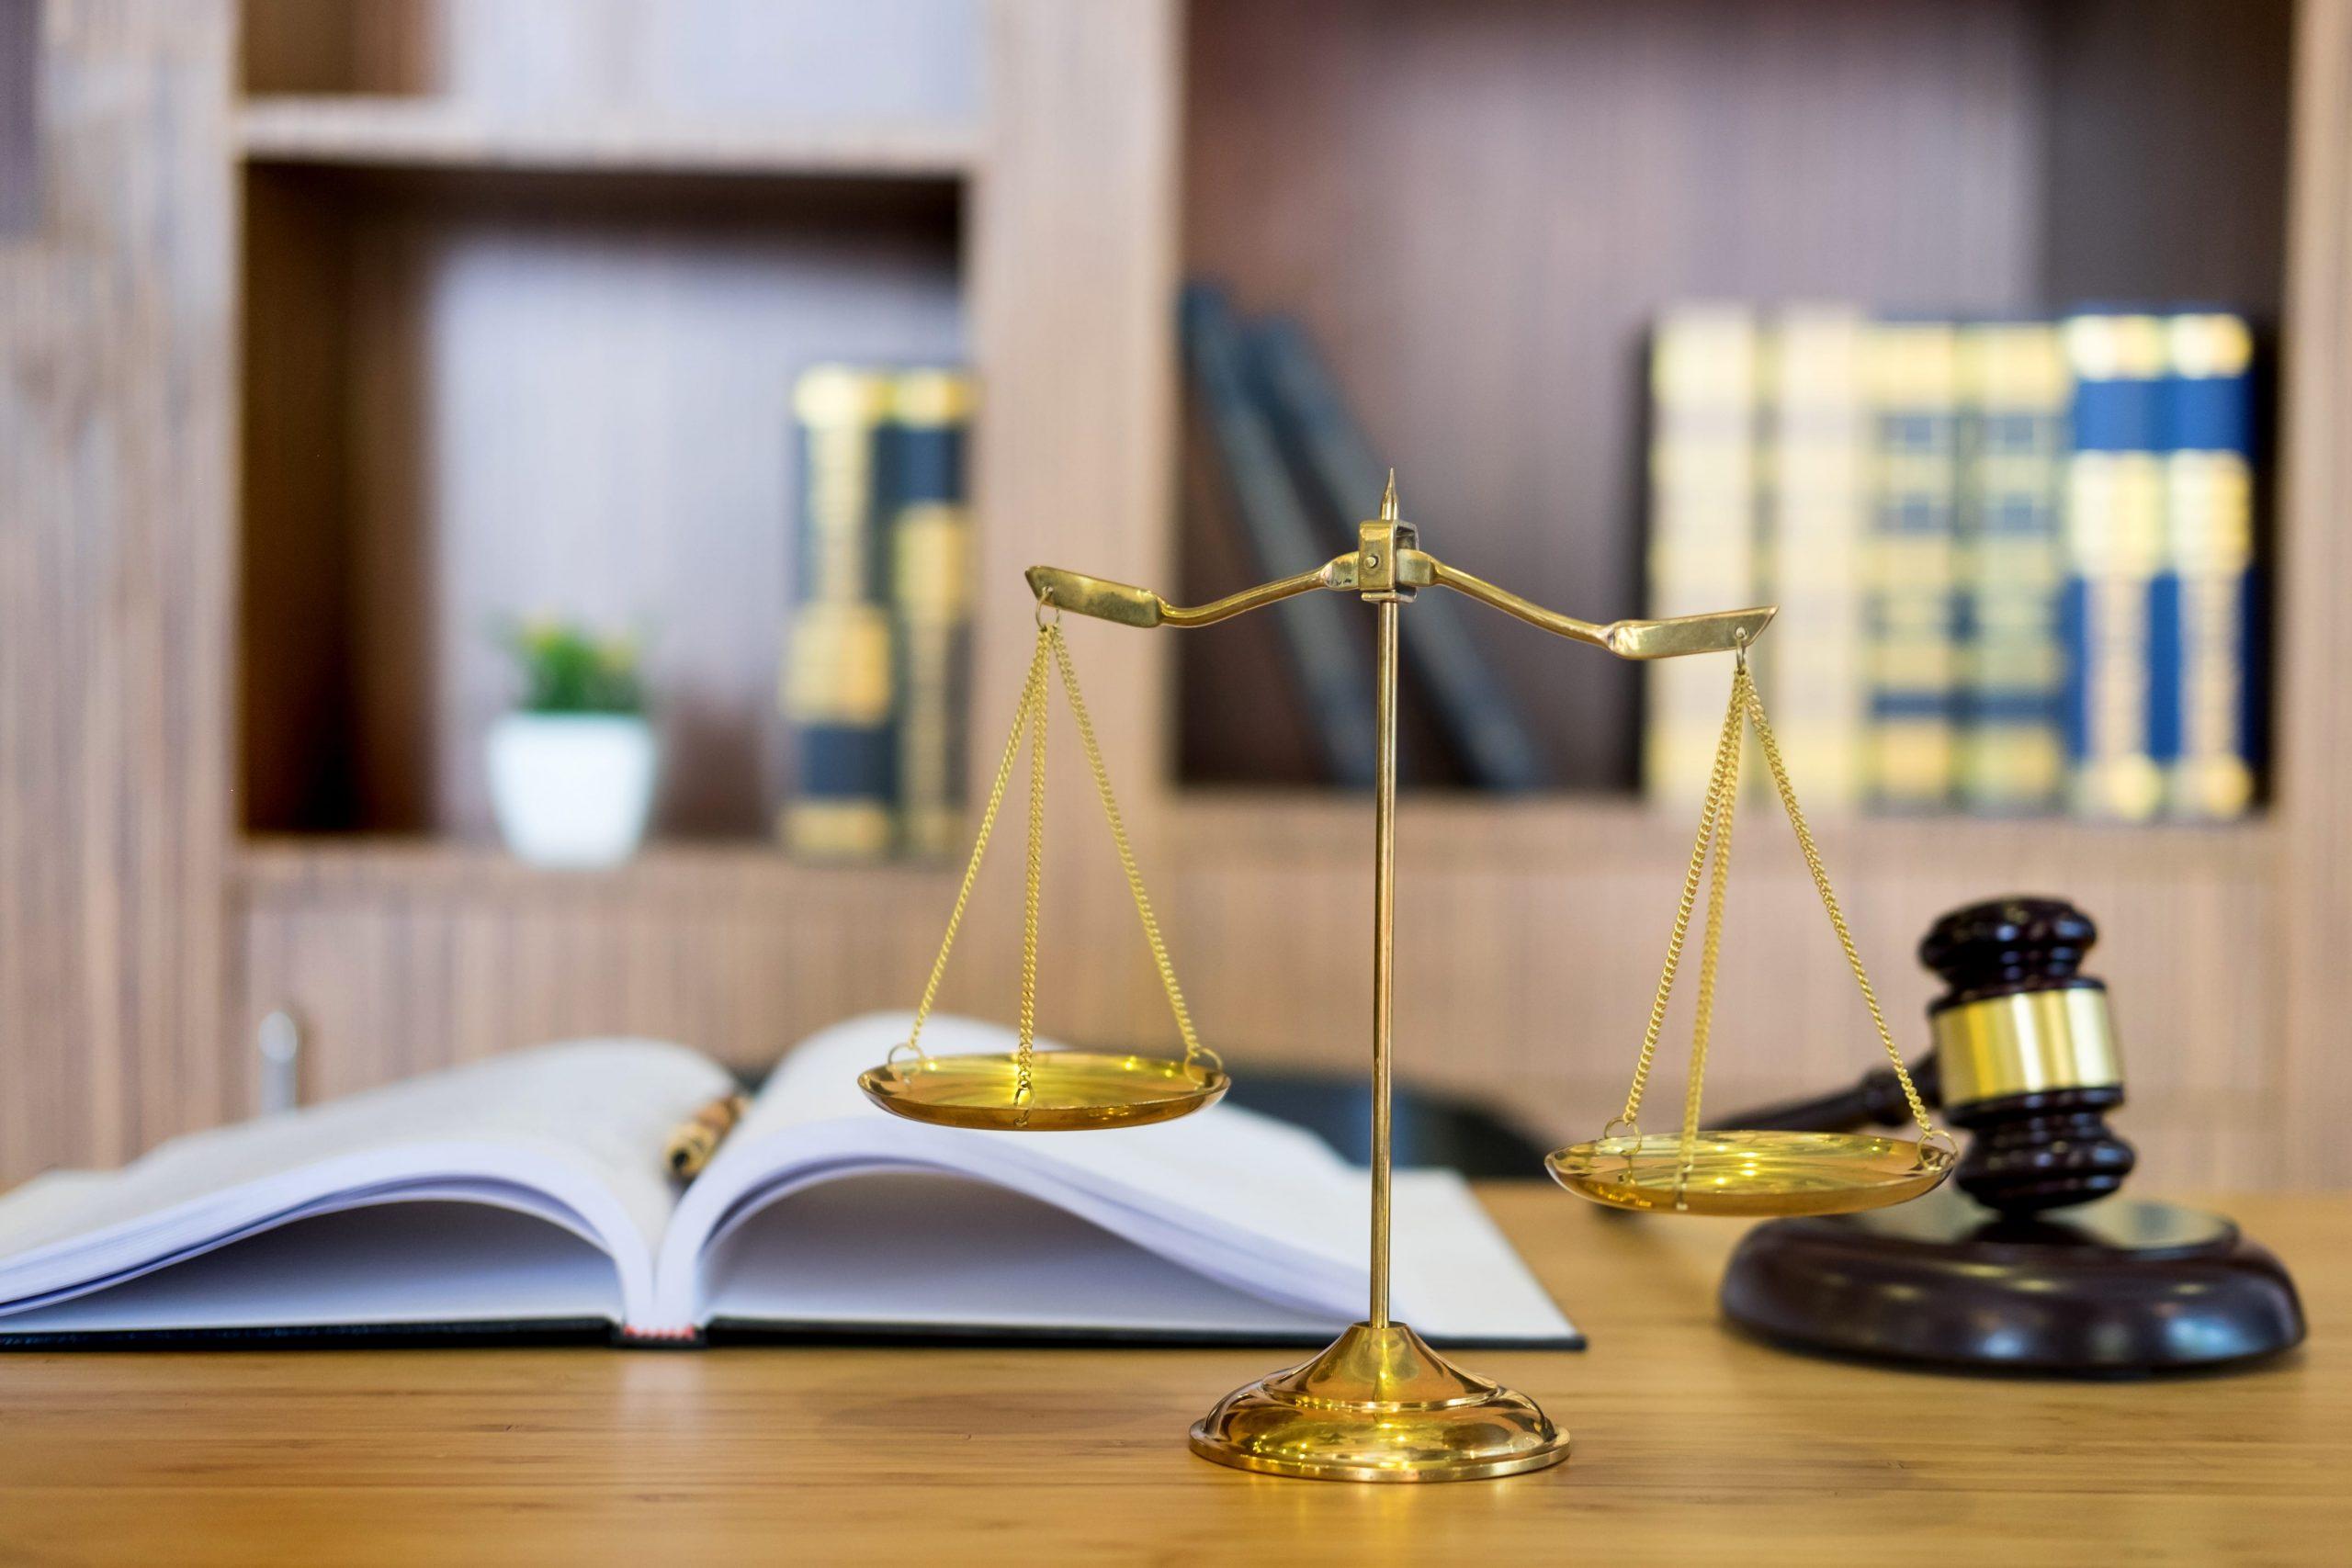 symbol-of-judge-law-attorney-gavel-with-justice-la-29NVU8G-min